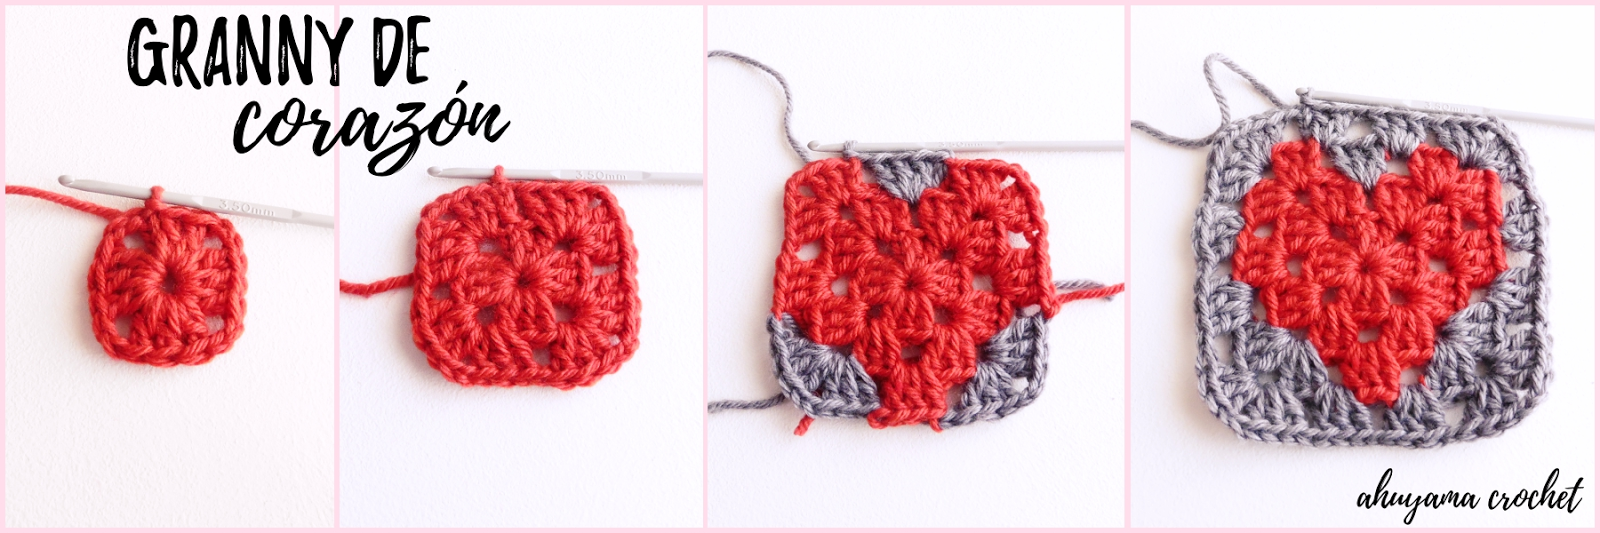 Gorro de corazones a crochet - Ahuyama Crochet